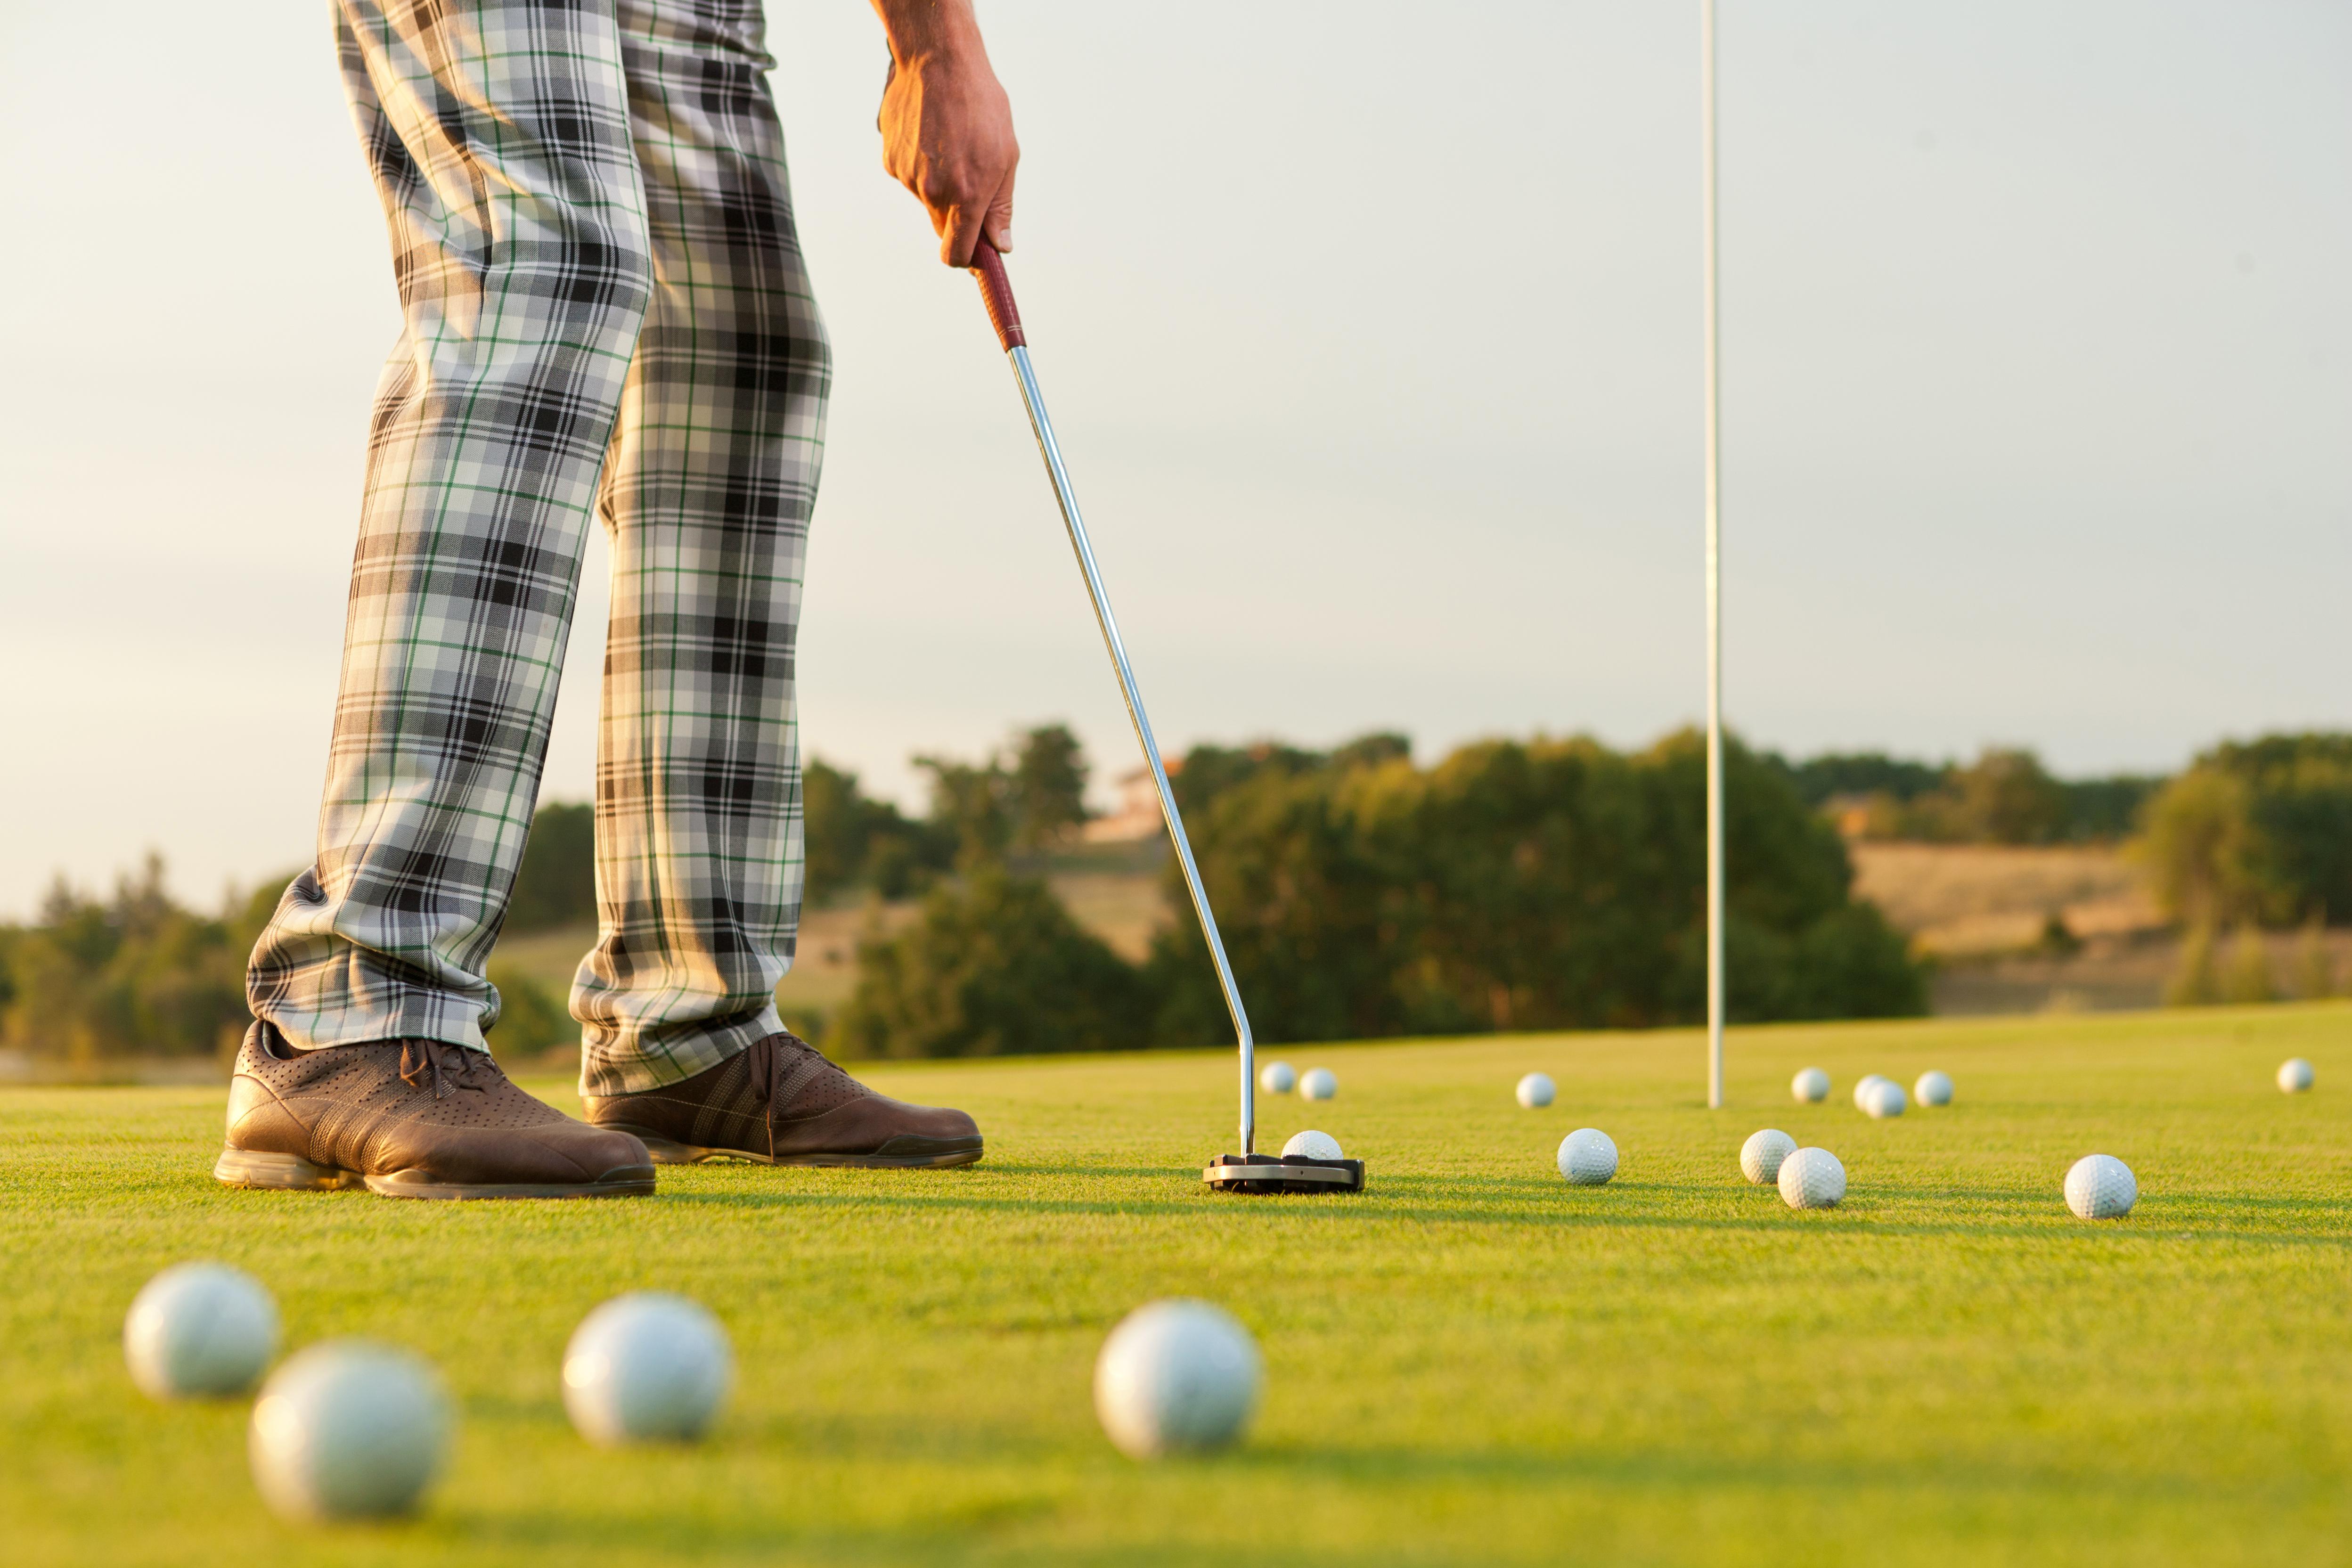 спорт sports гольф Golf  № 3310259 без смс